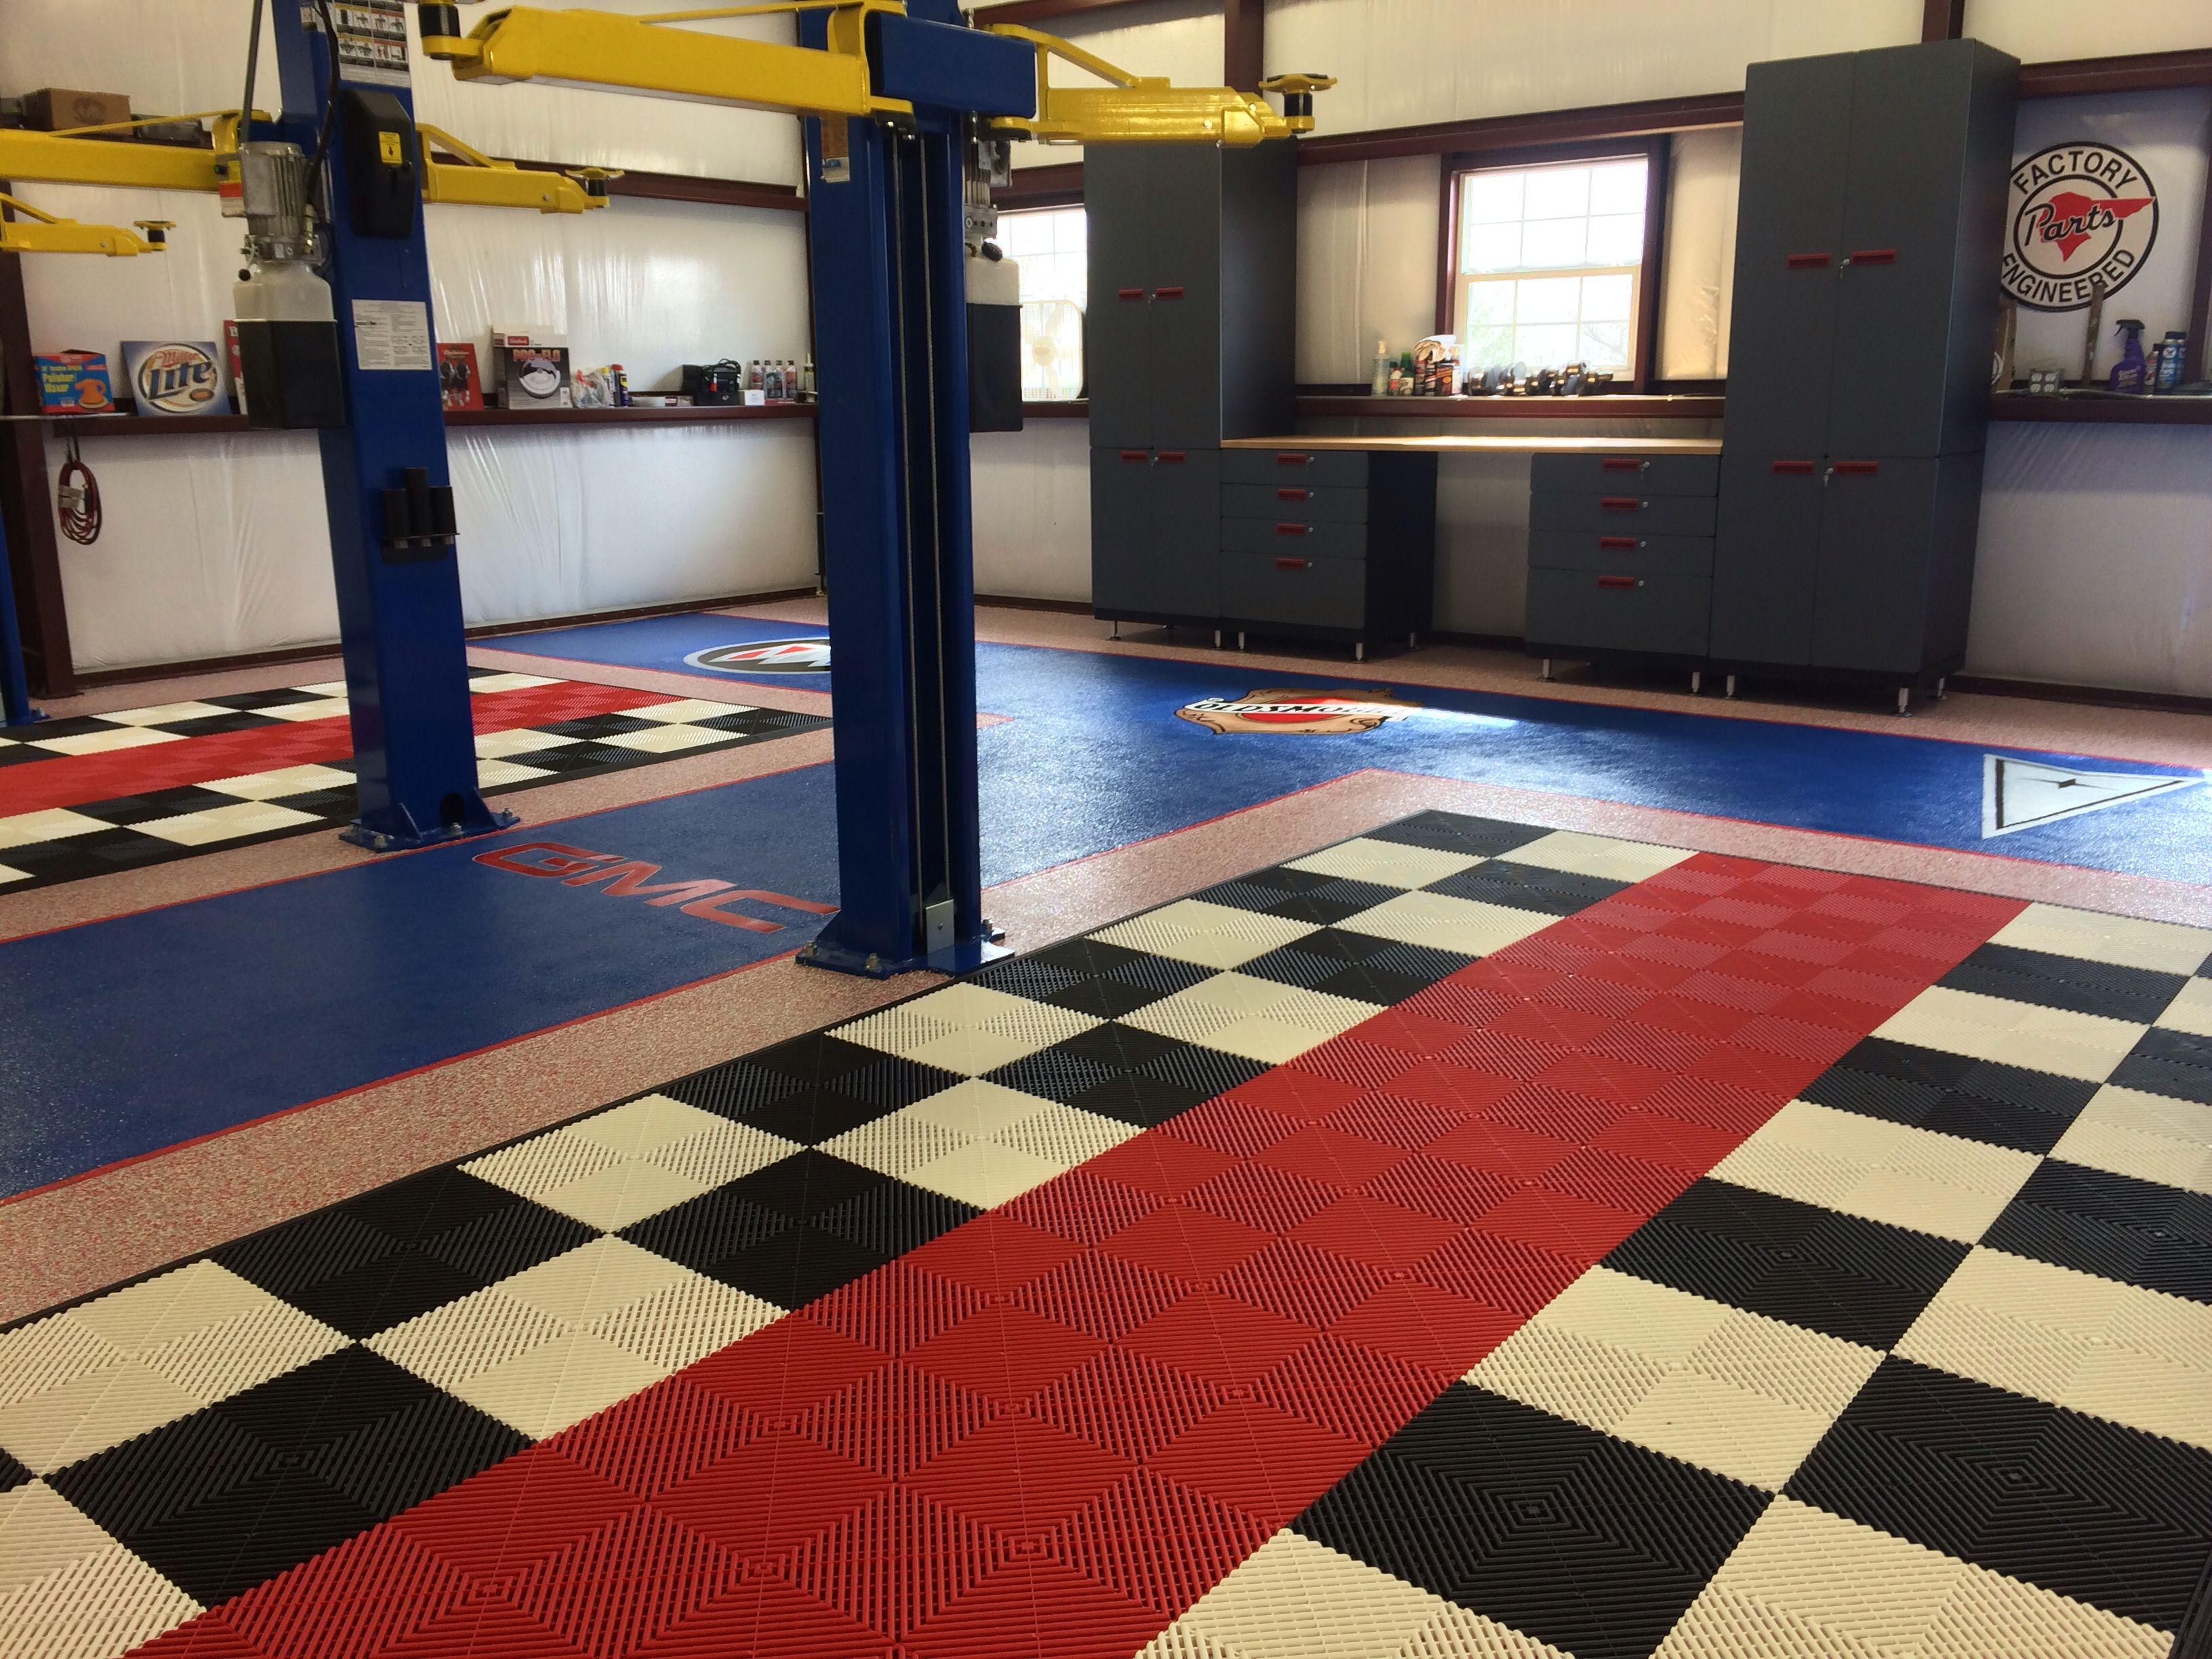 Harley color carpet tiles - Harley Color Carpet Tiles 41